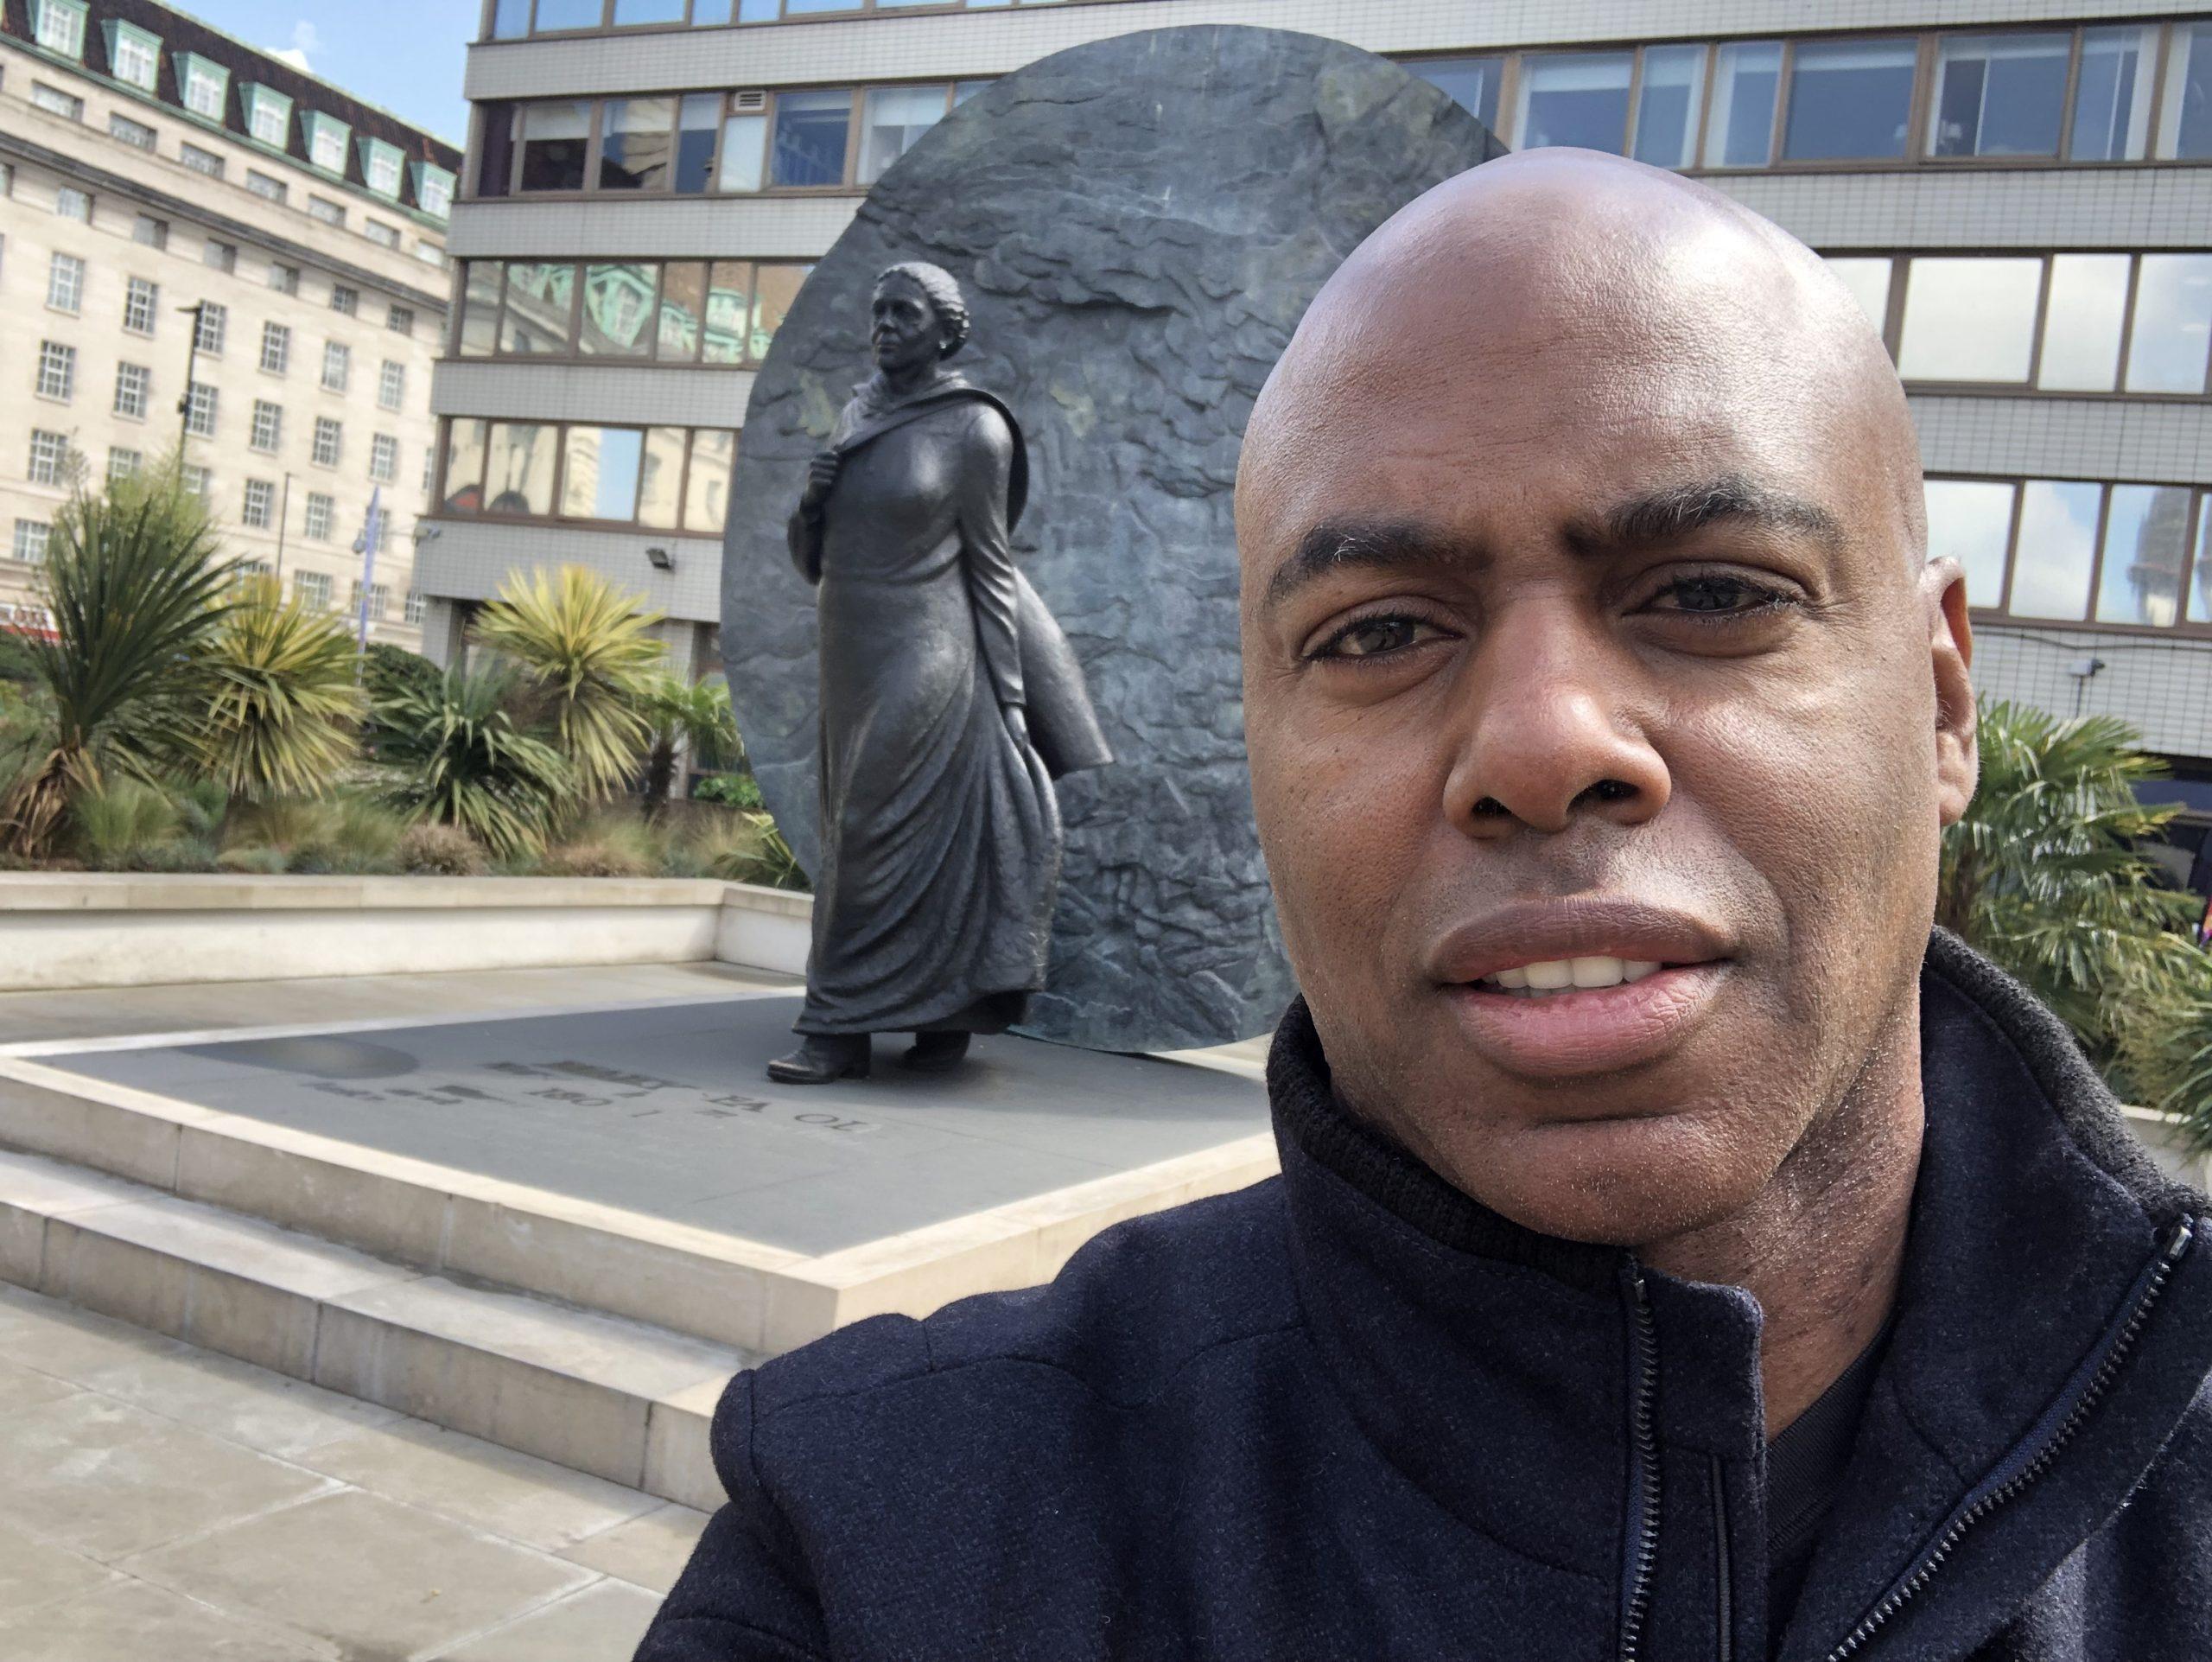 Mary Seacole Statue, The London Landmark Hiding in Plain Sight